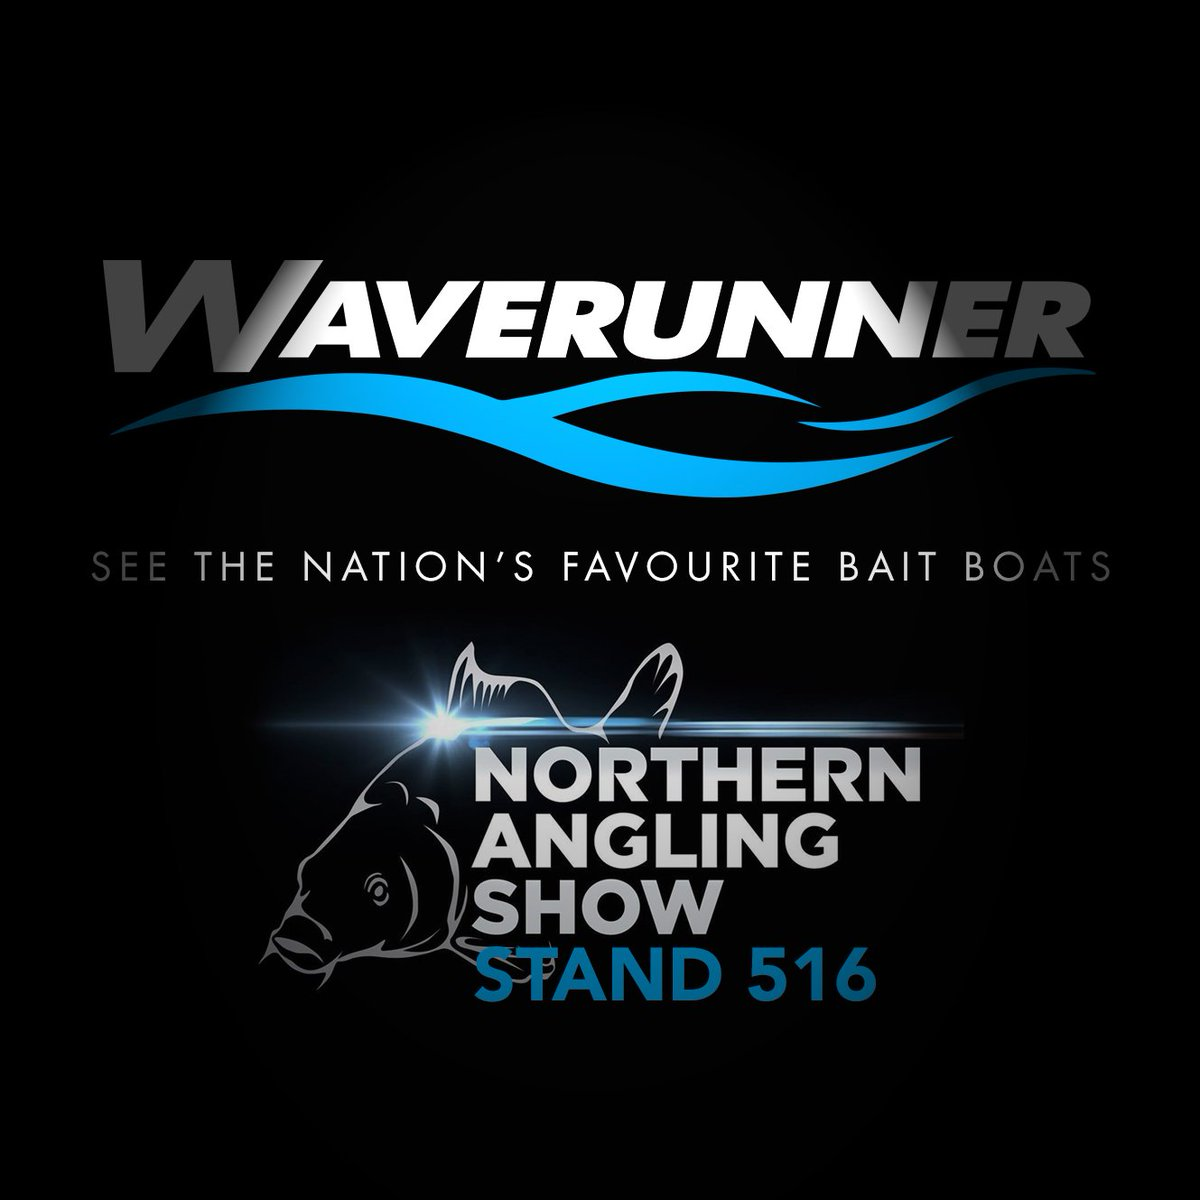 #NAS #Northern #<b>Baitboat</b> #carpfishing #waverunner https://t.co/g7b5GF2EwI